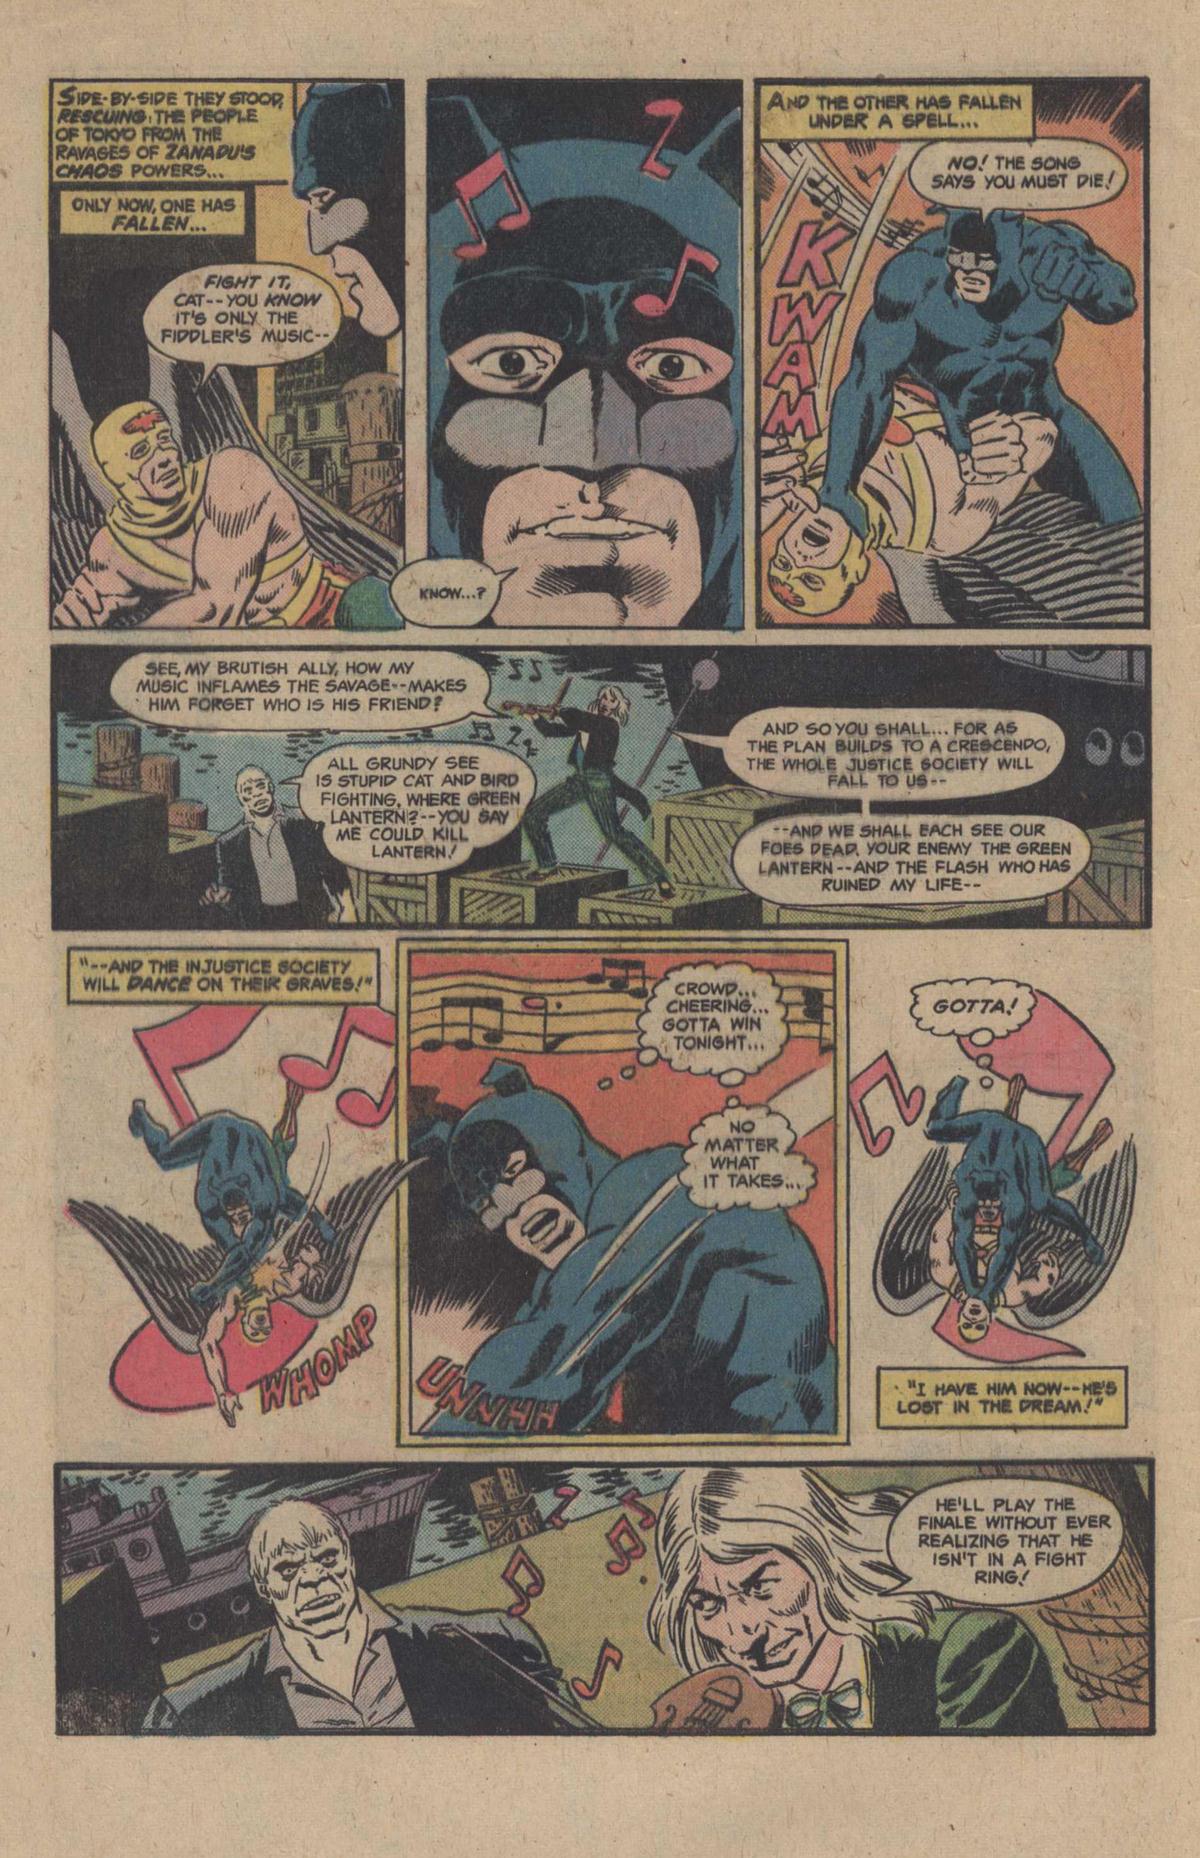 Read online All-Star Comics comic -  Issue #63 - 4